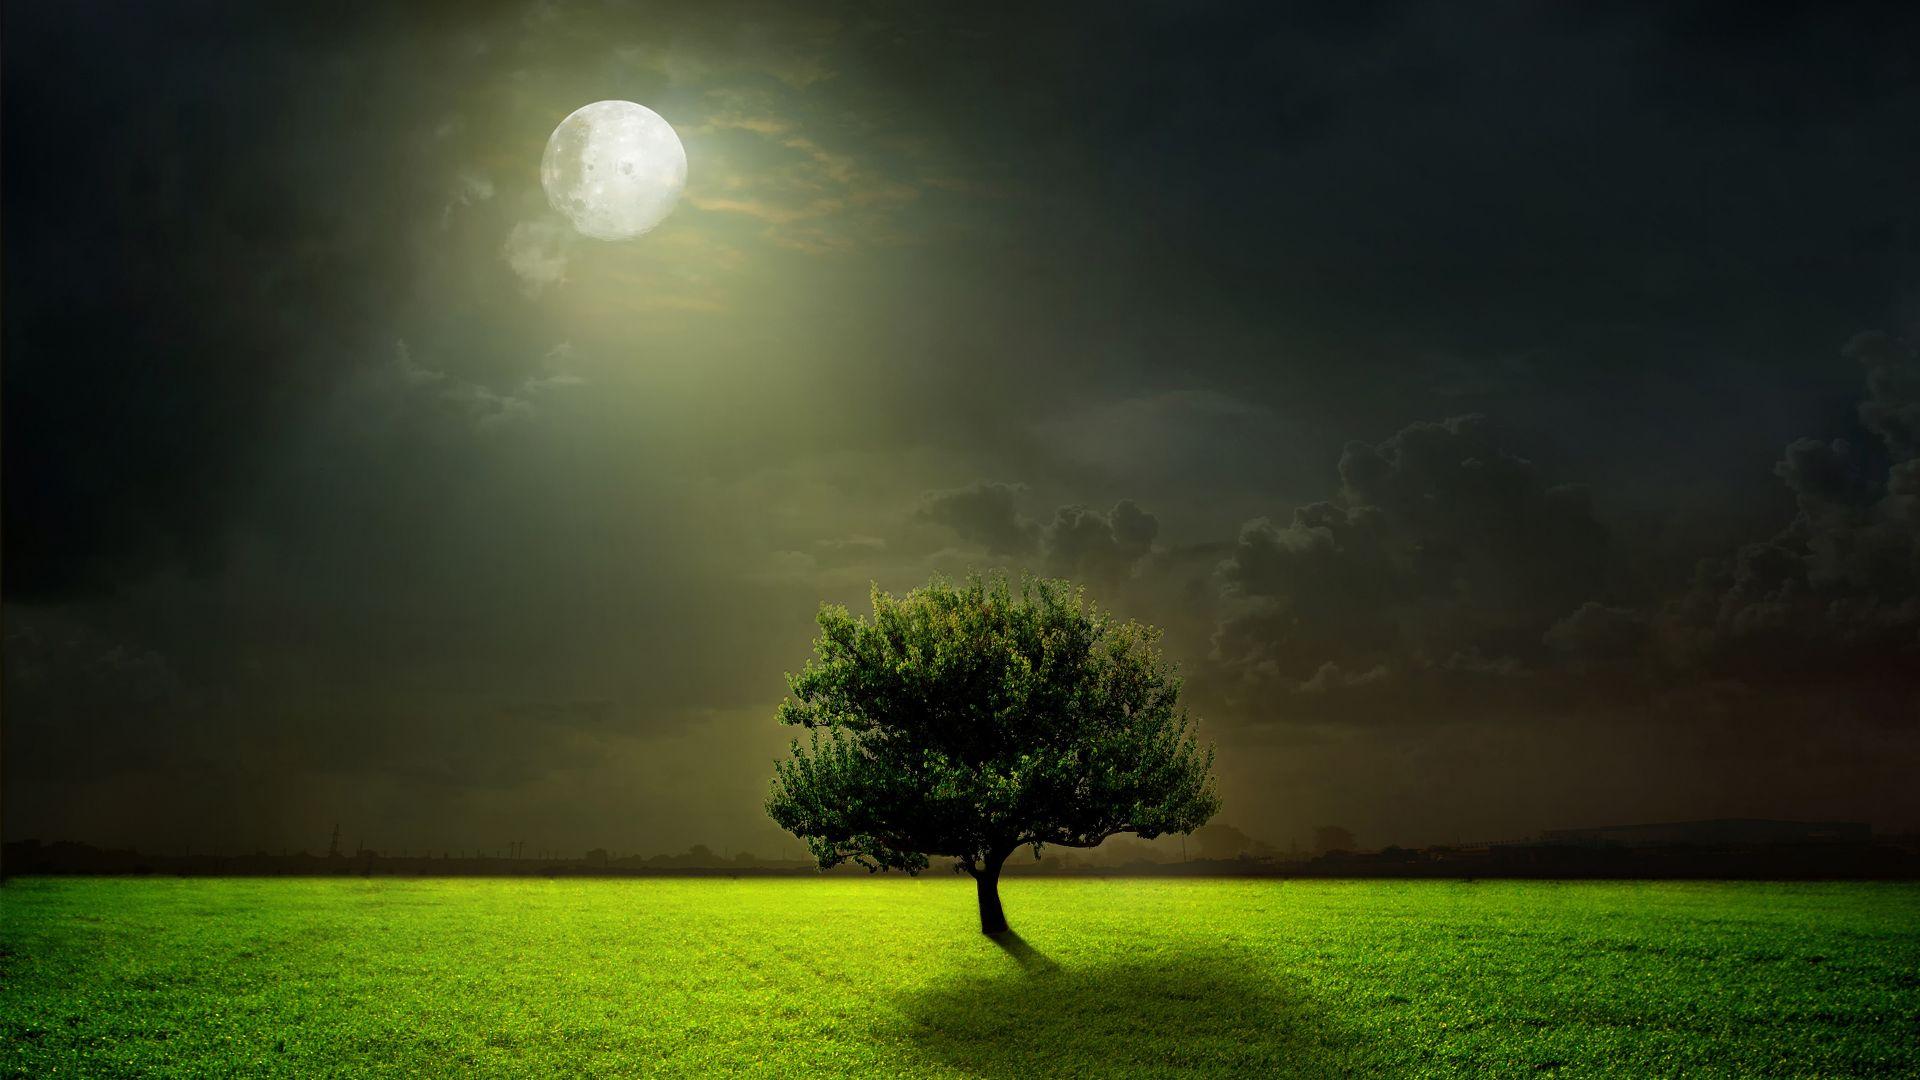 Top Wallpaper Night Grass - 6131  Snapshot-246631.jpg